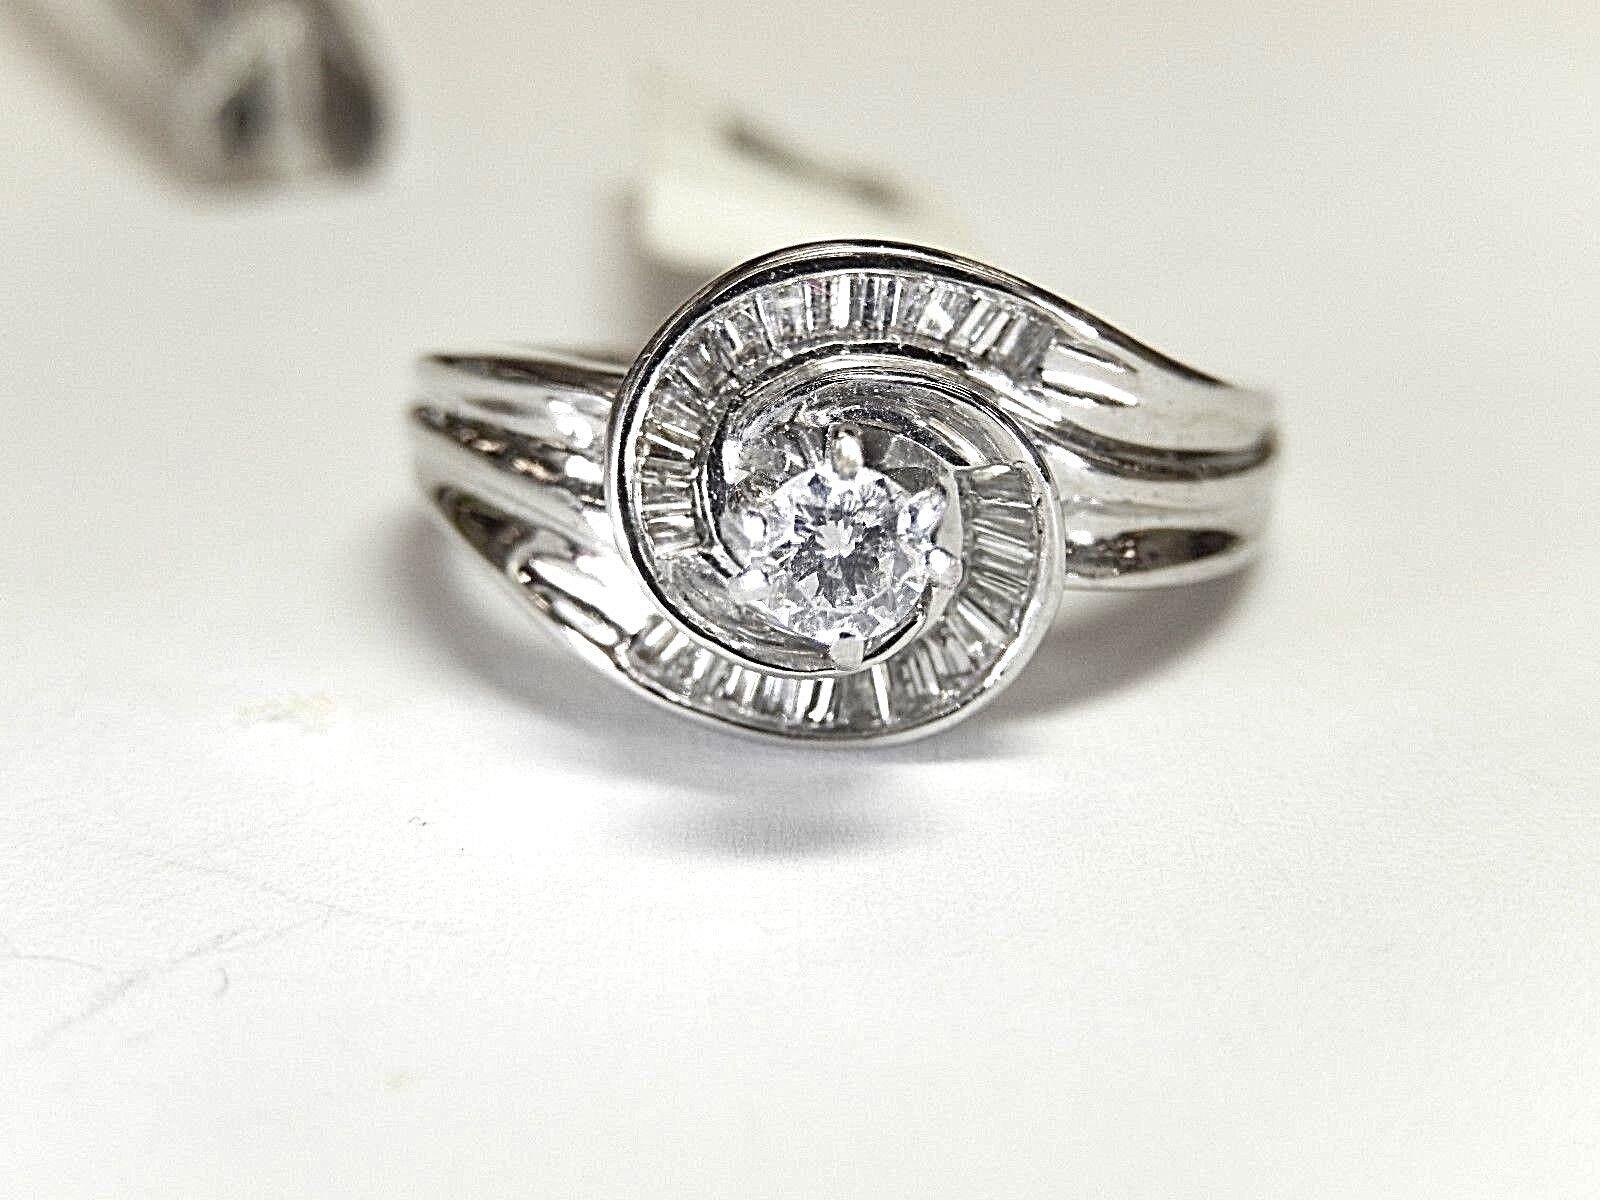 14K White gold .50CT Natural VS Diamond Engagement Halo Swirl  Ring Size 8.75